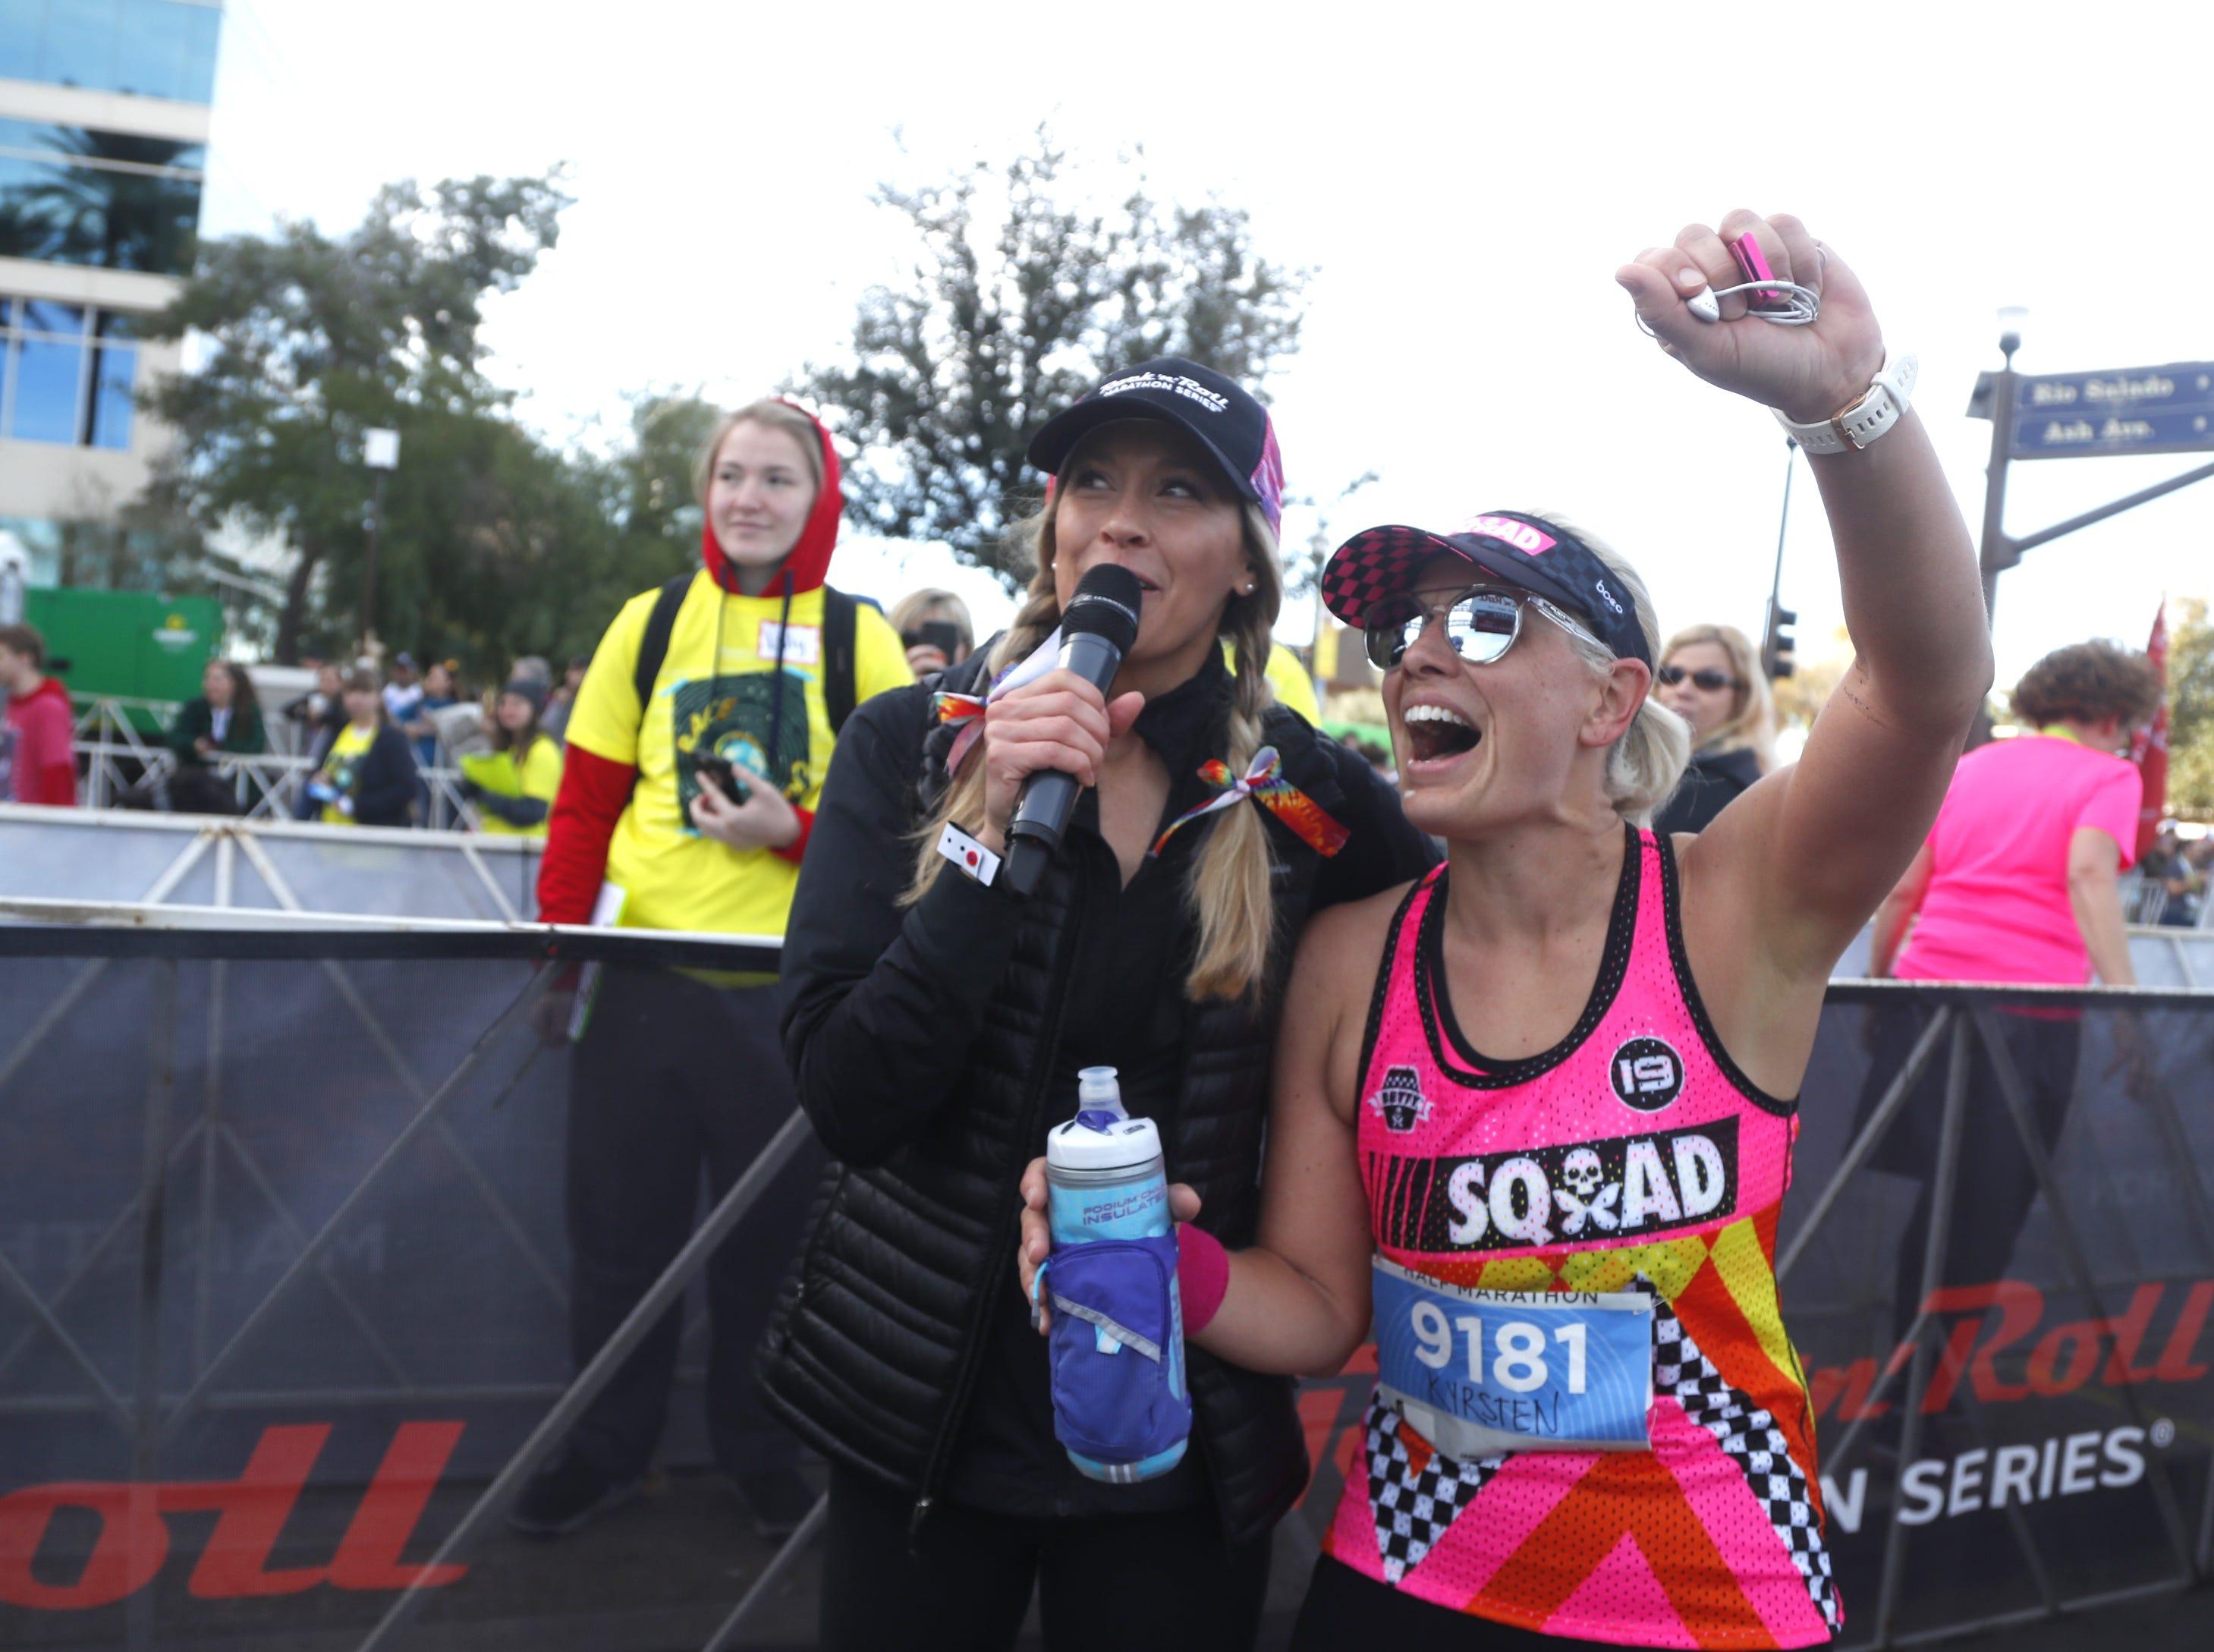 Sen. Kyrsten Sinema celebrates with emcee Ann Wessling after Sinema finished the Rock 'N' Roll half-marathon in Tempe on Jan. 20, 2019.